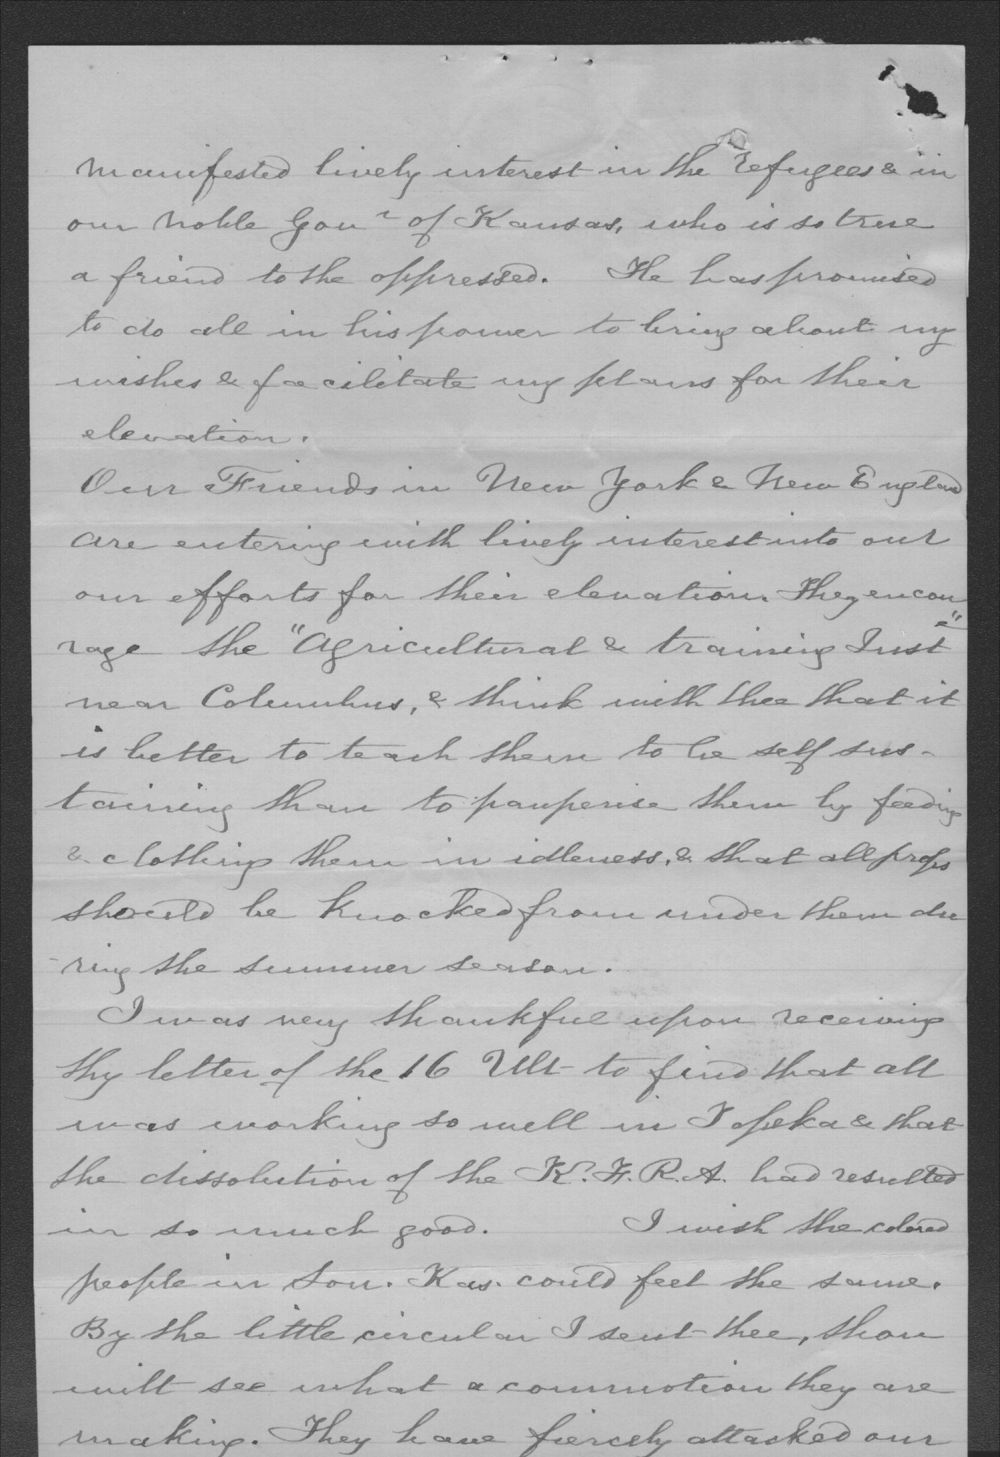 Elizabeth Comstock to John P. St. John - 2